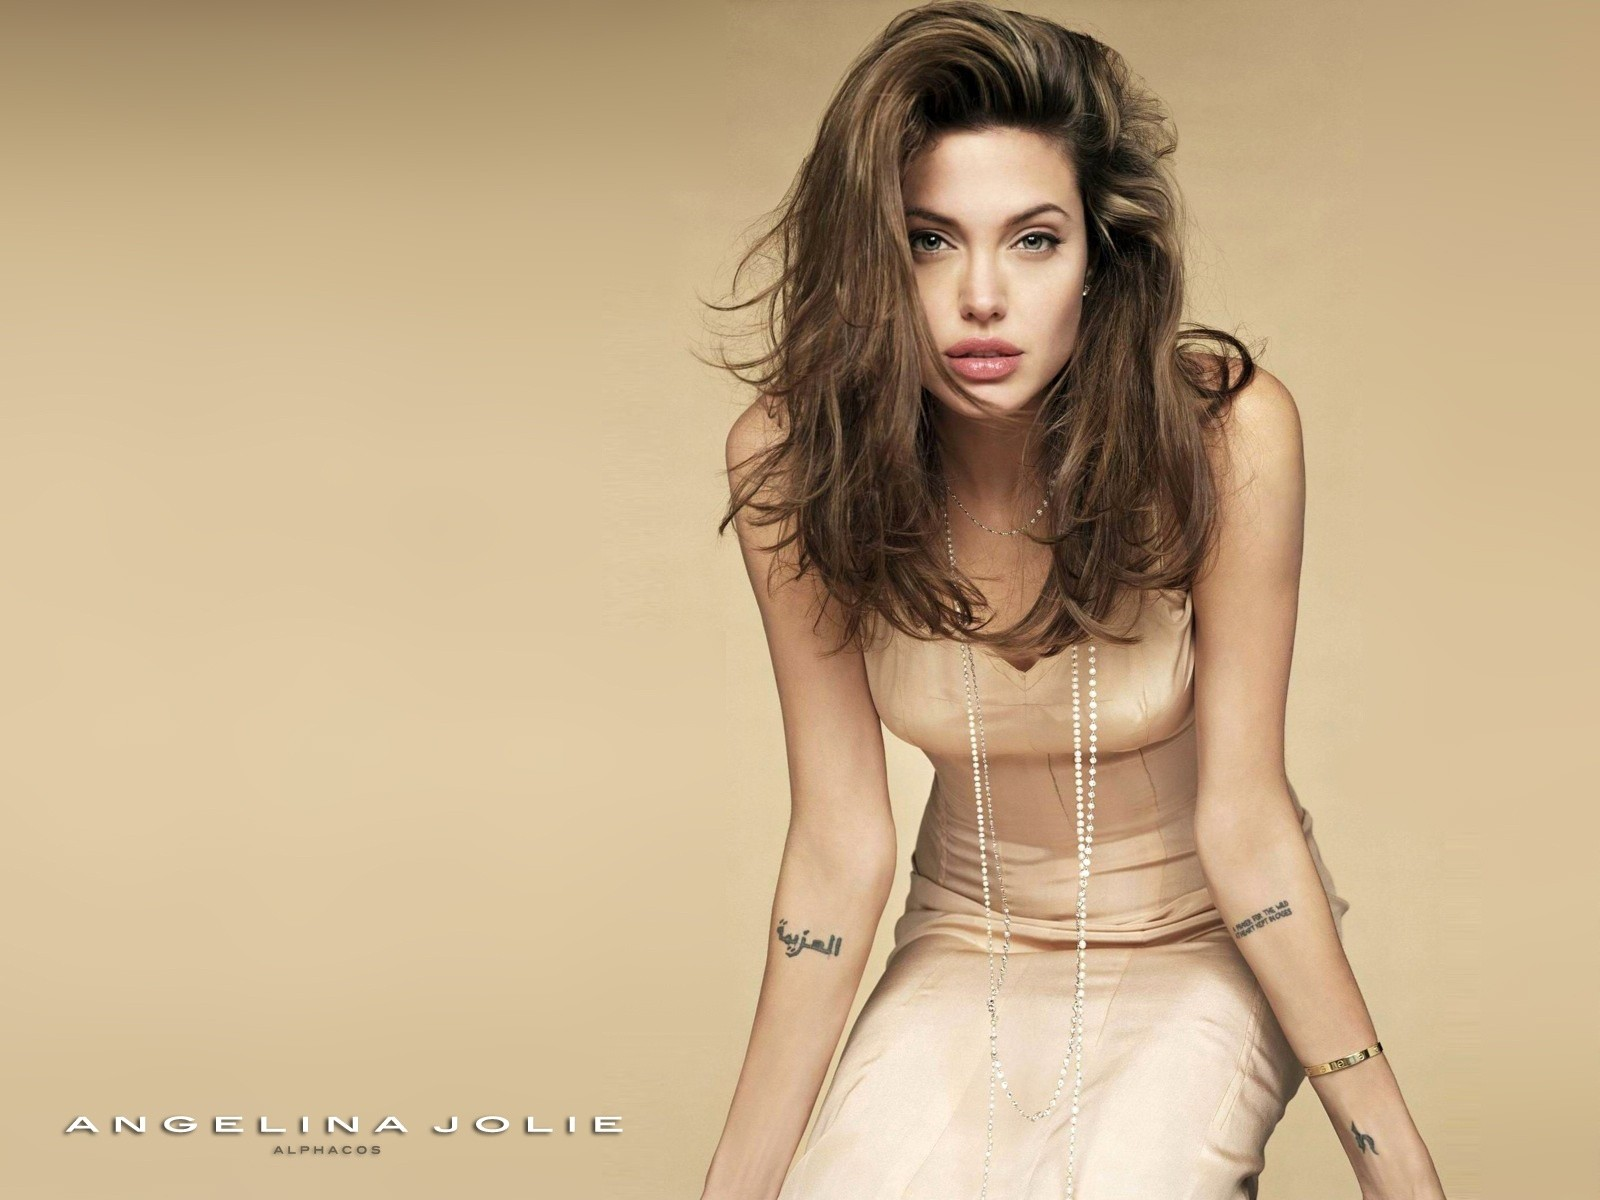 Top Hottest Models: Angelina Jolie (2 Pics